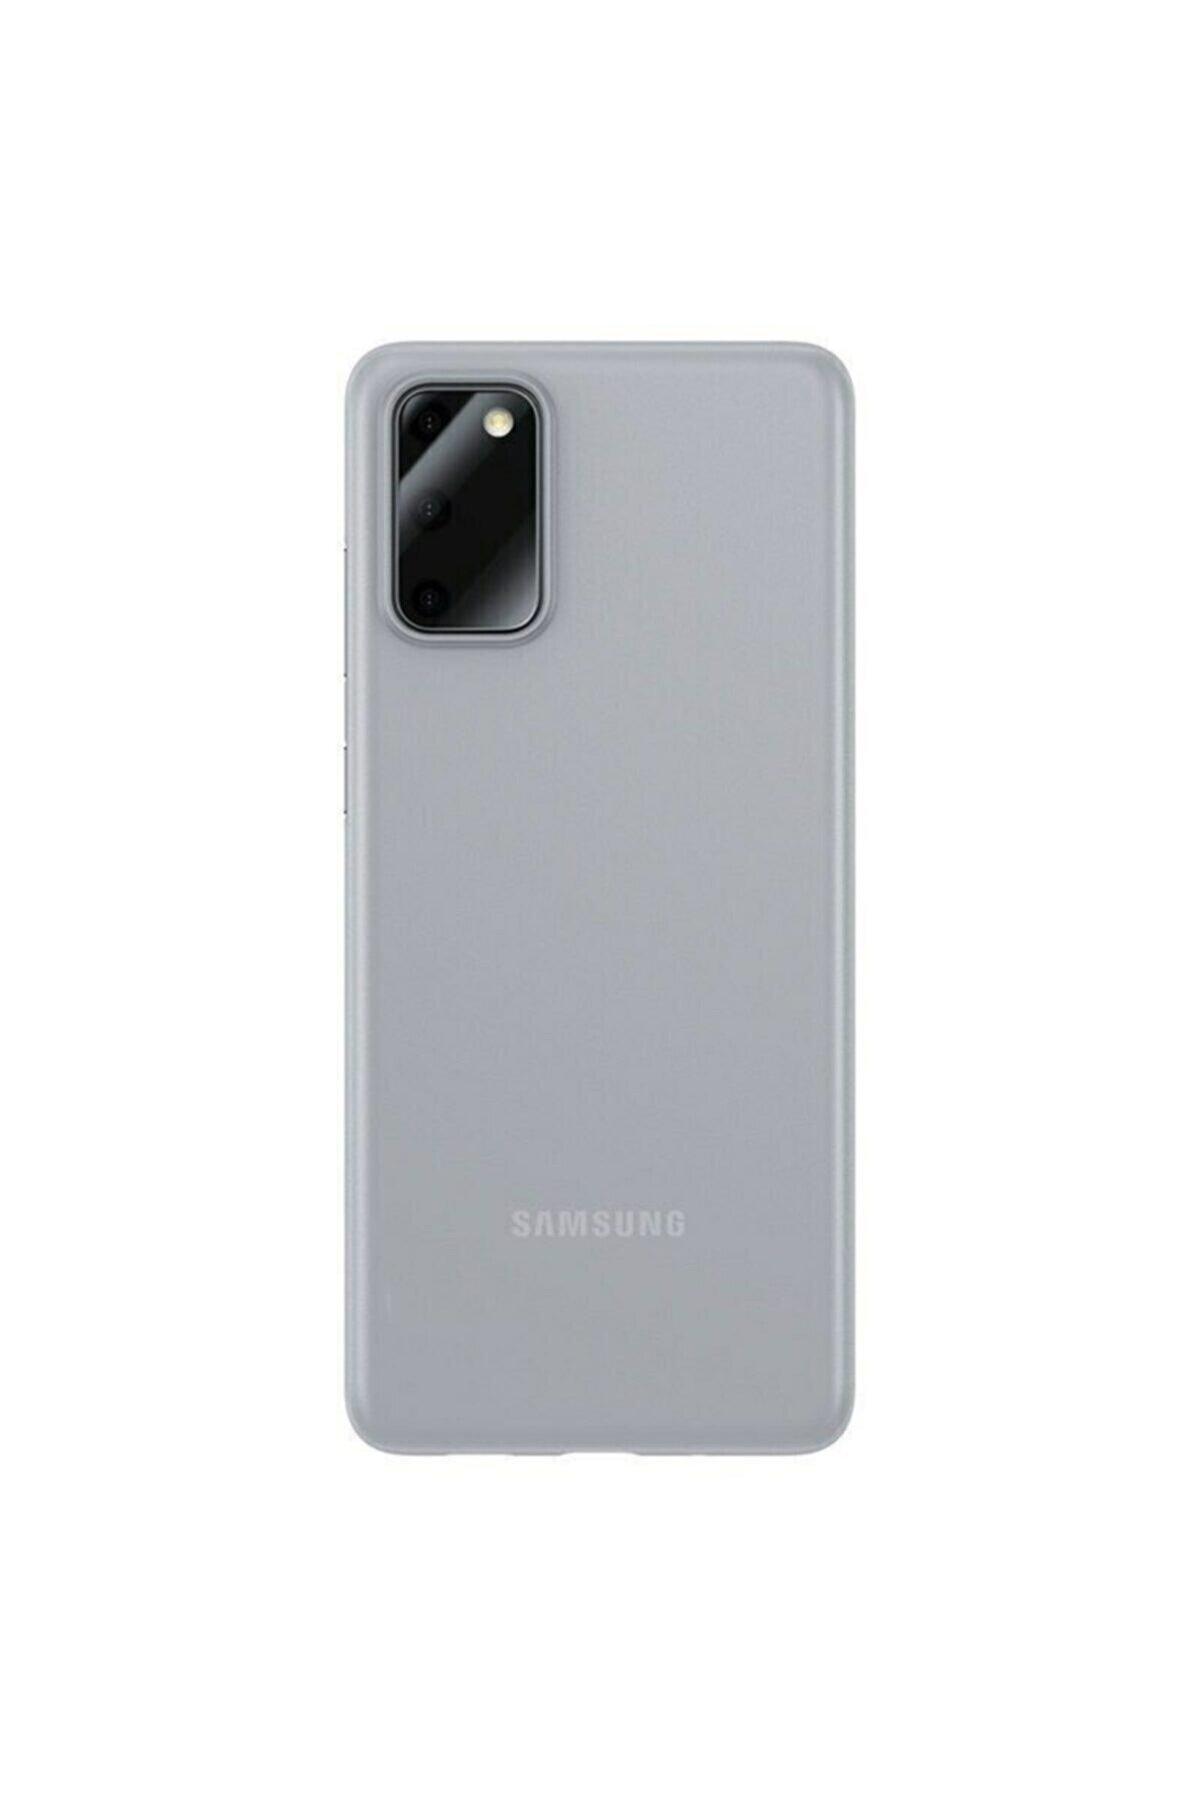 Samsung Teleplus Galaxy S20 Plus Kılıf Hayalet 0.4mm Silikon Şeffaf